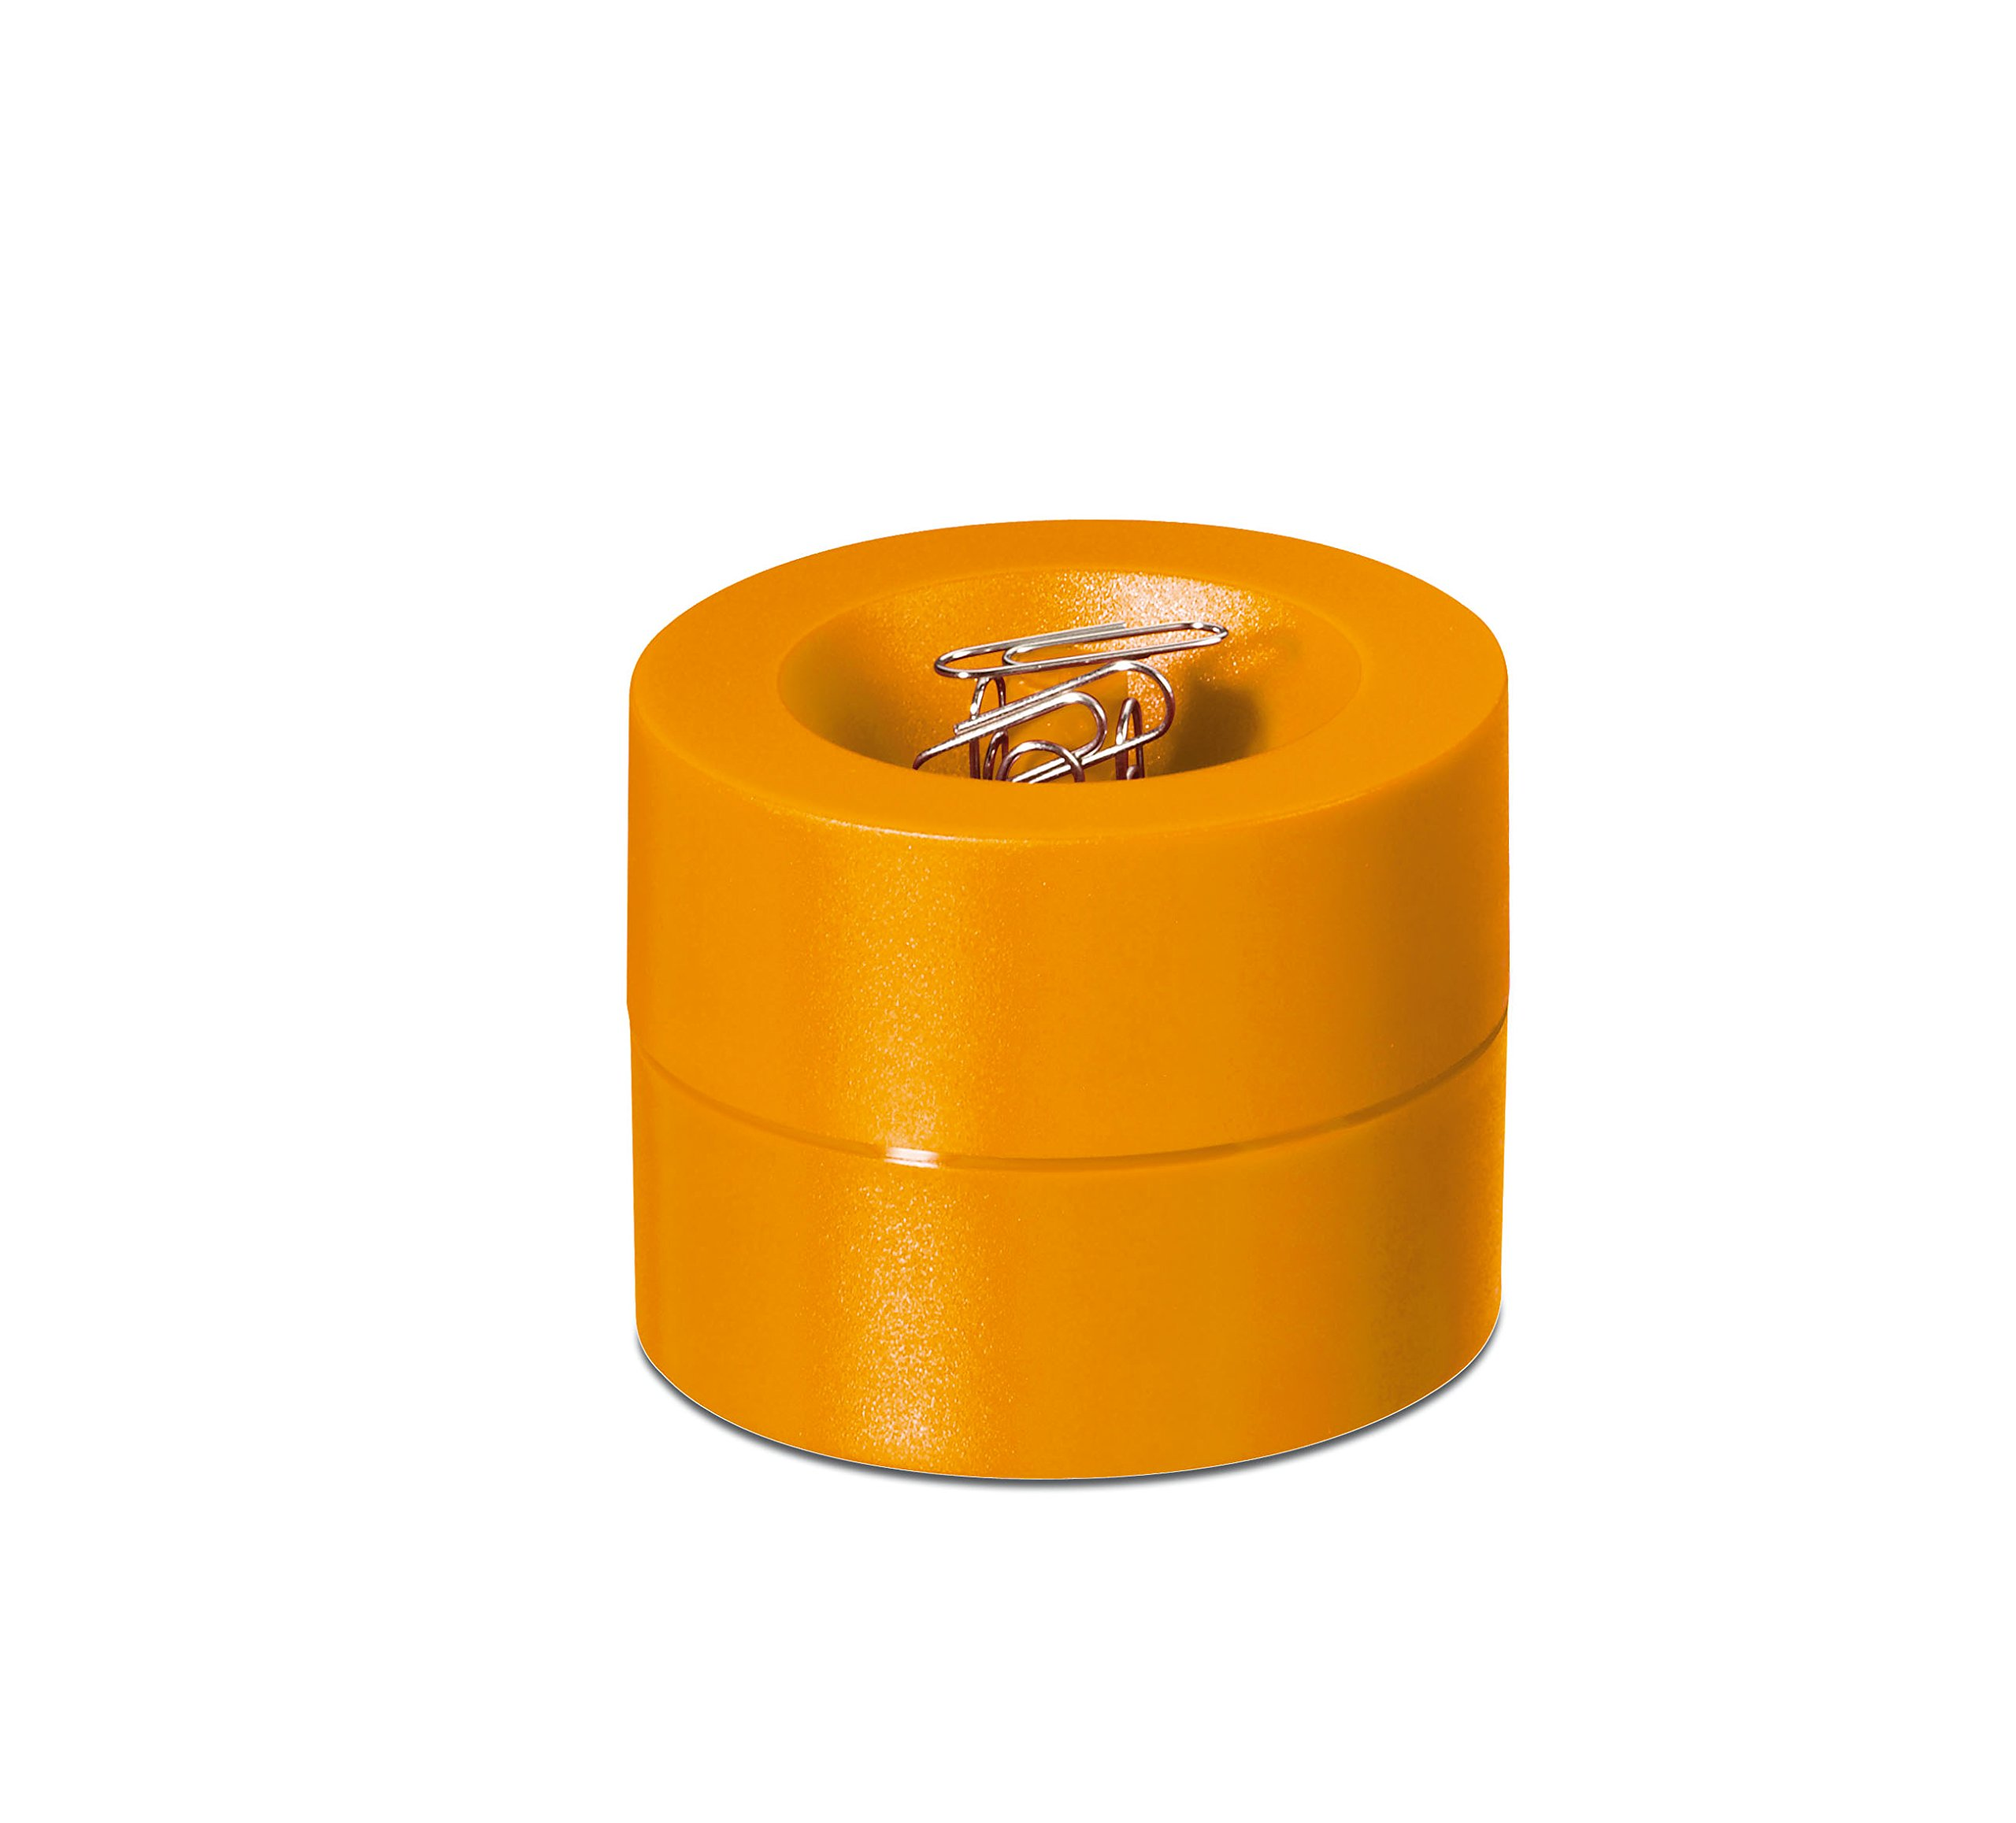 Maul-3012382-Klammernspender-Magnet